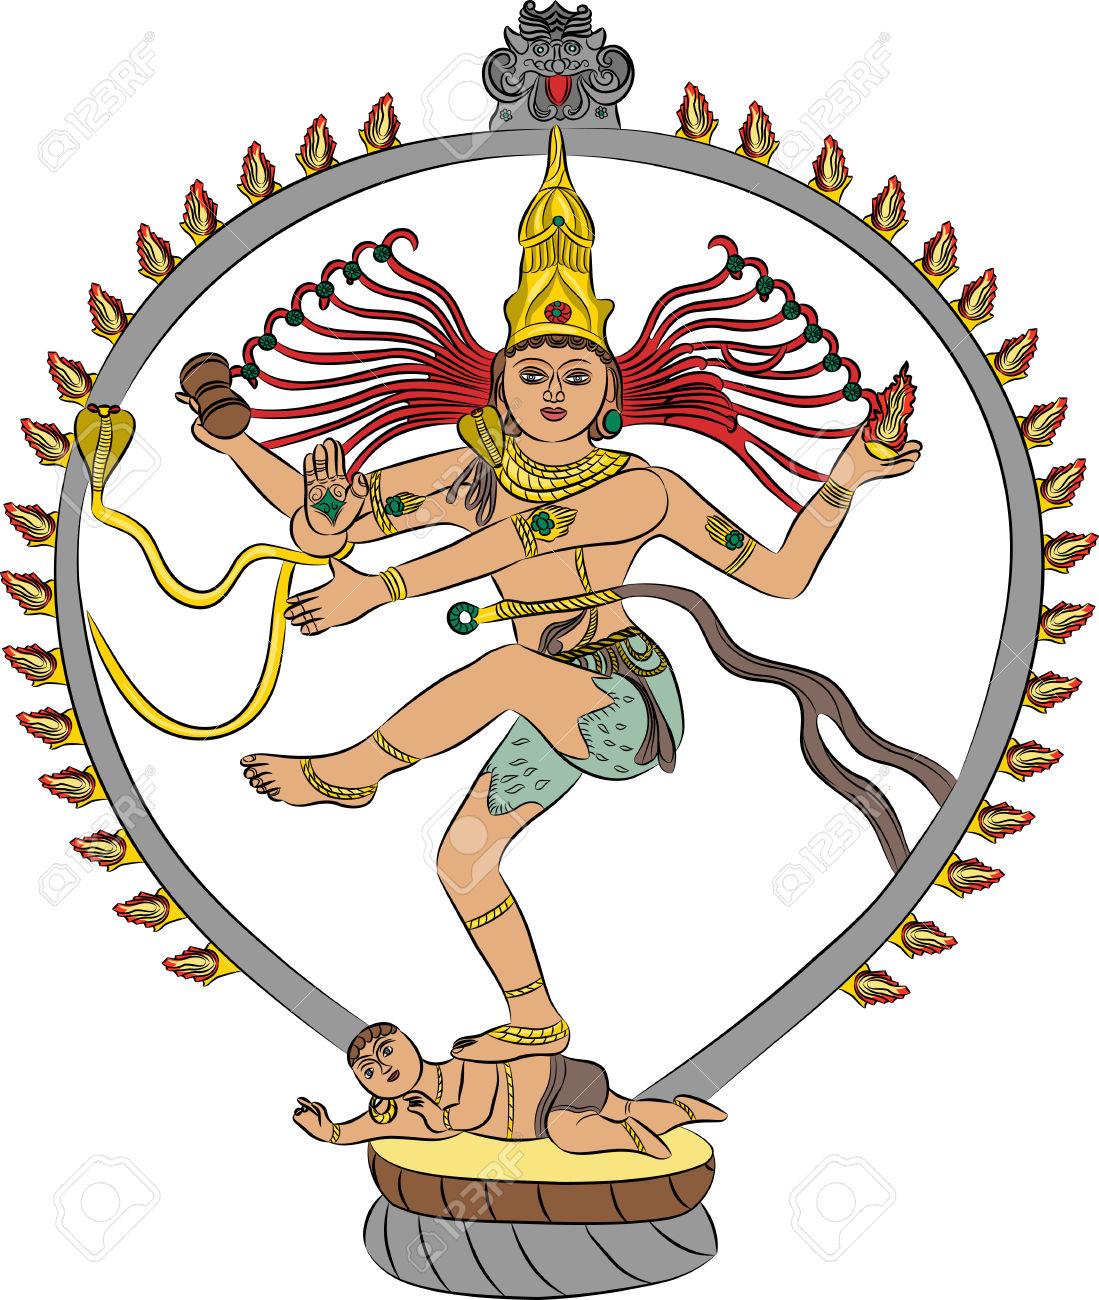 123 Shakti Stock Illustrations, Cliparts And Royalty Free Shakti.